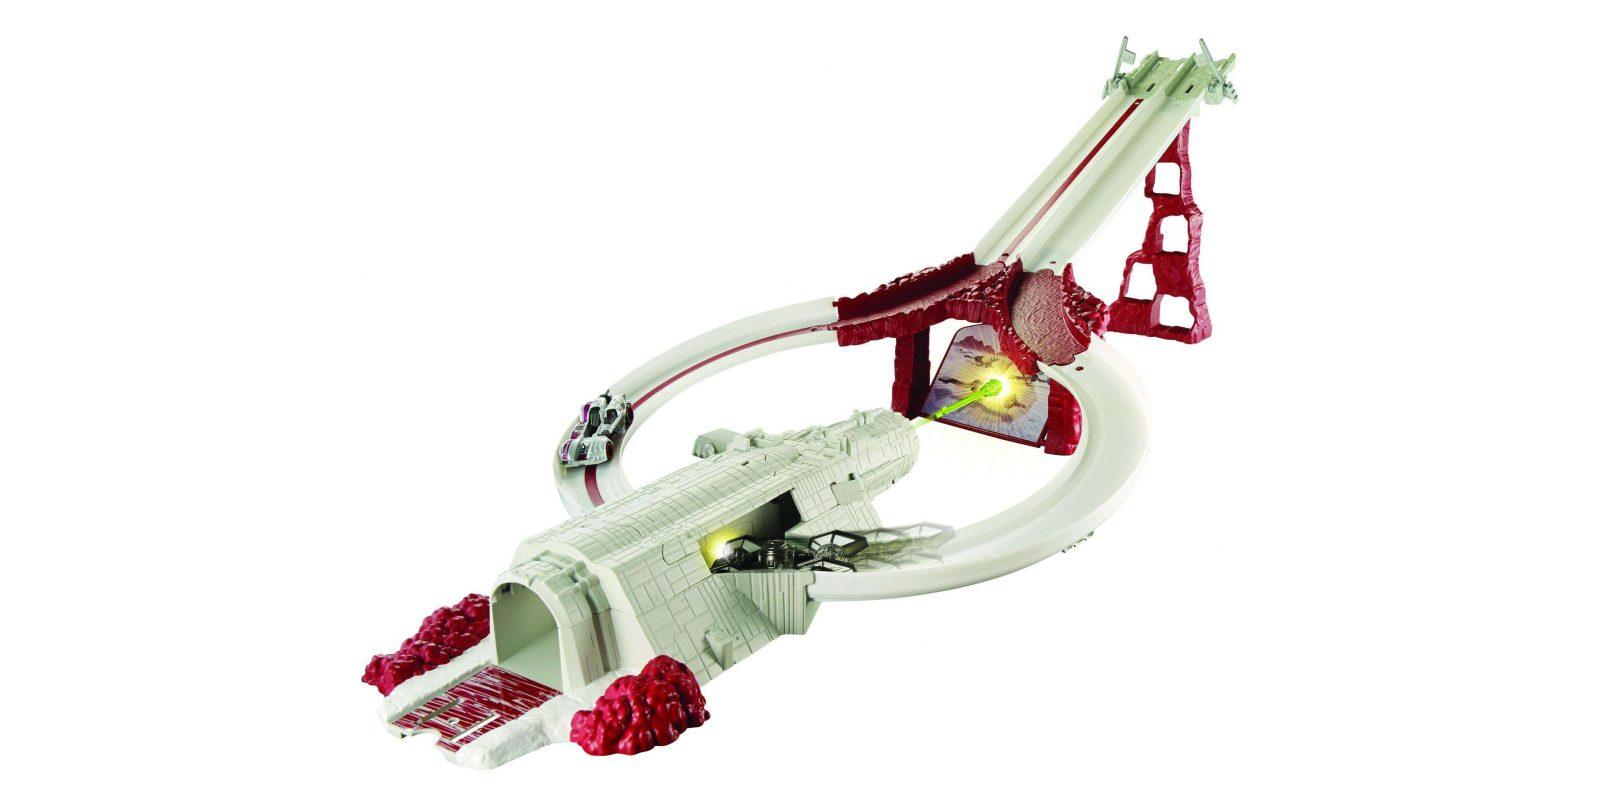 Hot Wheels Star Wars: The Last Jedi Crait Assault Raceway is now just $16